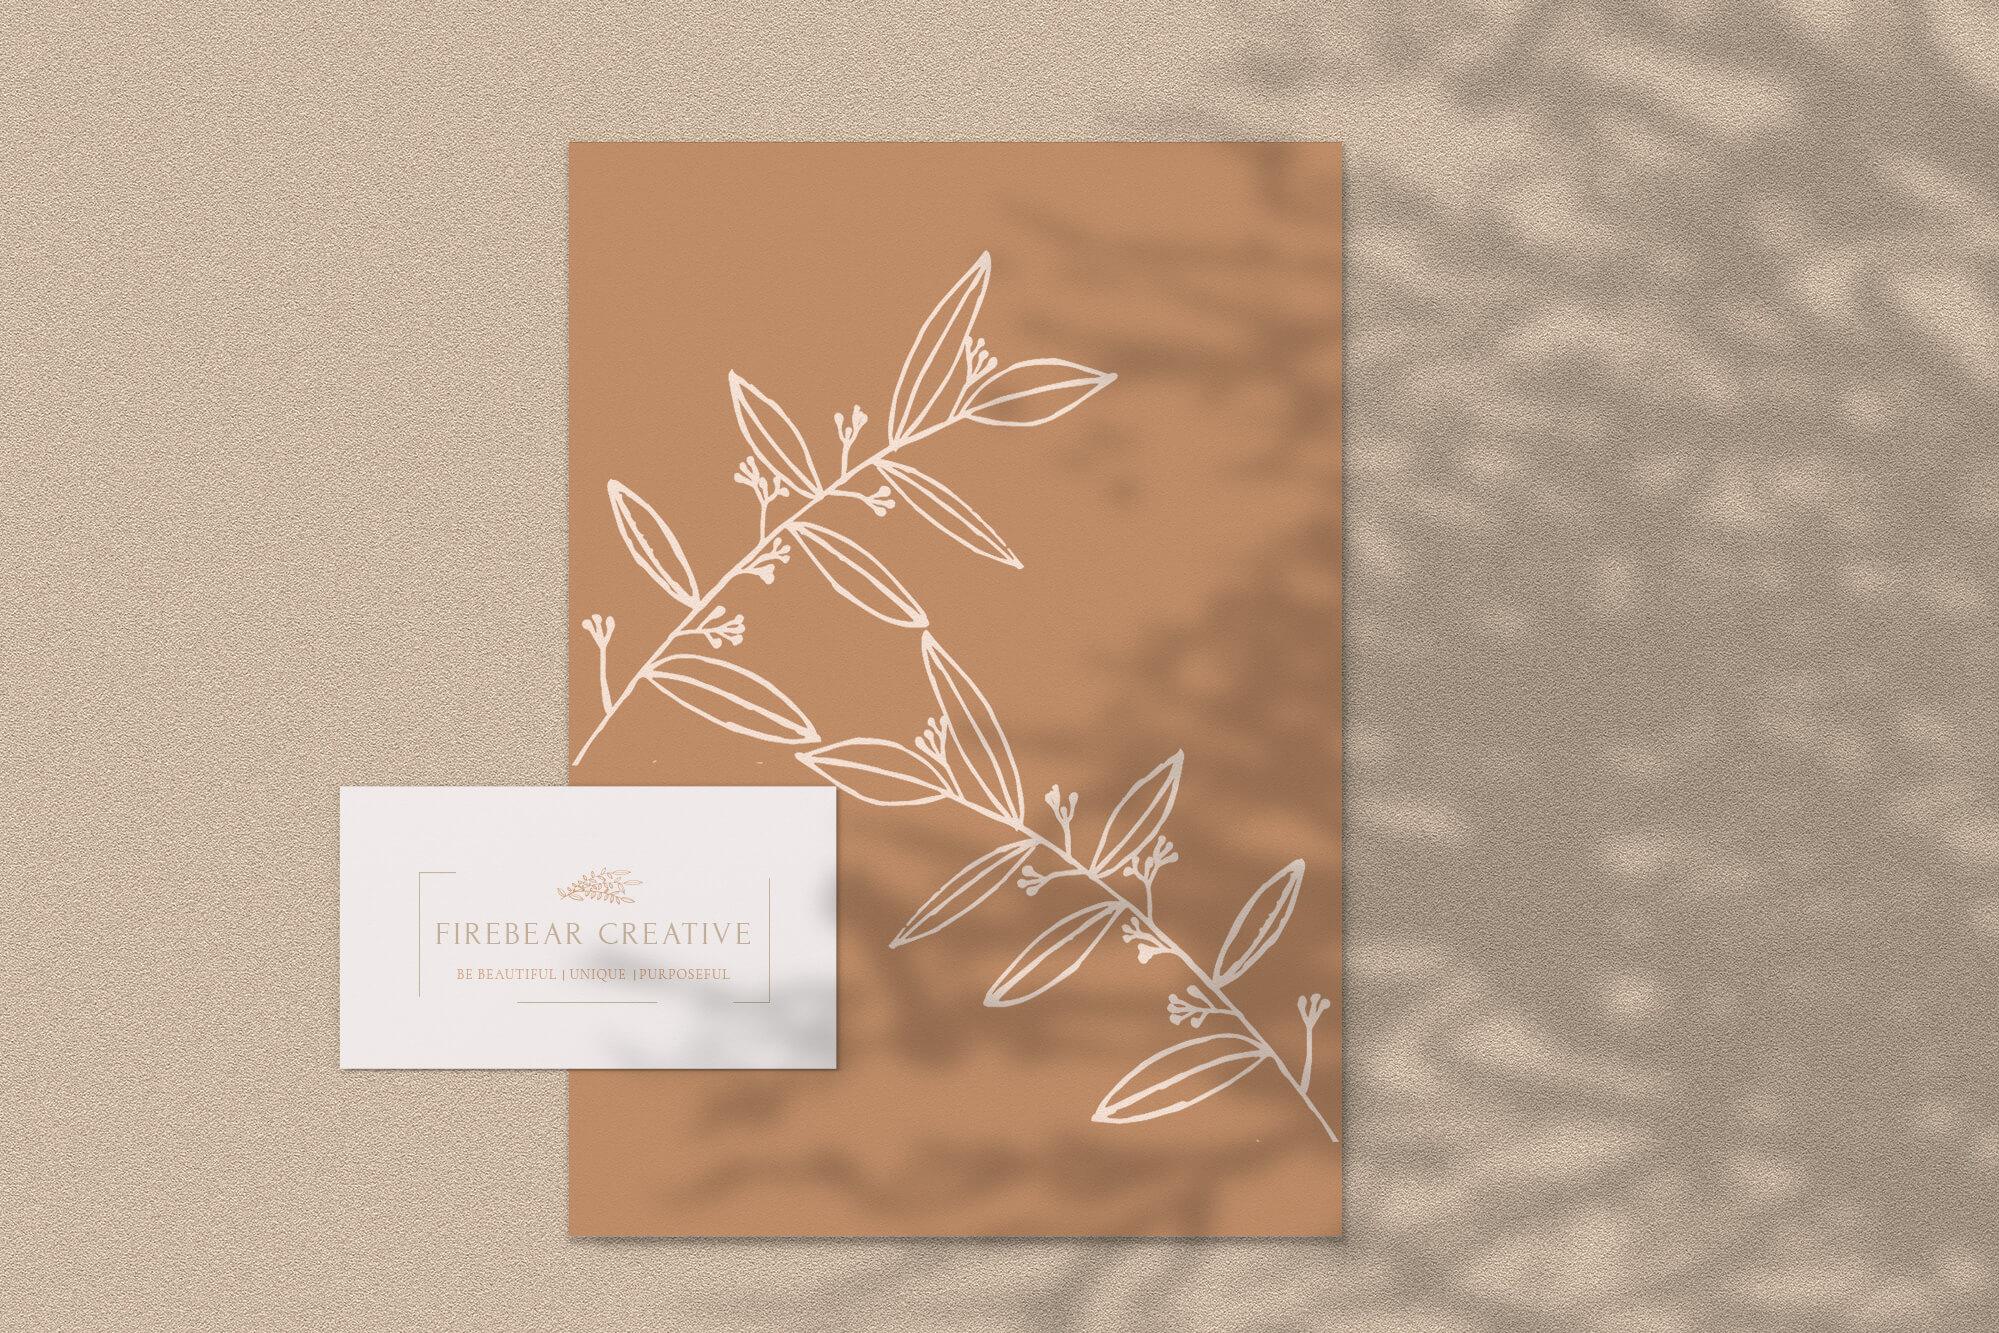 Brand identity & website design -